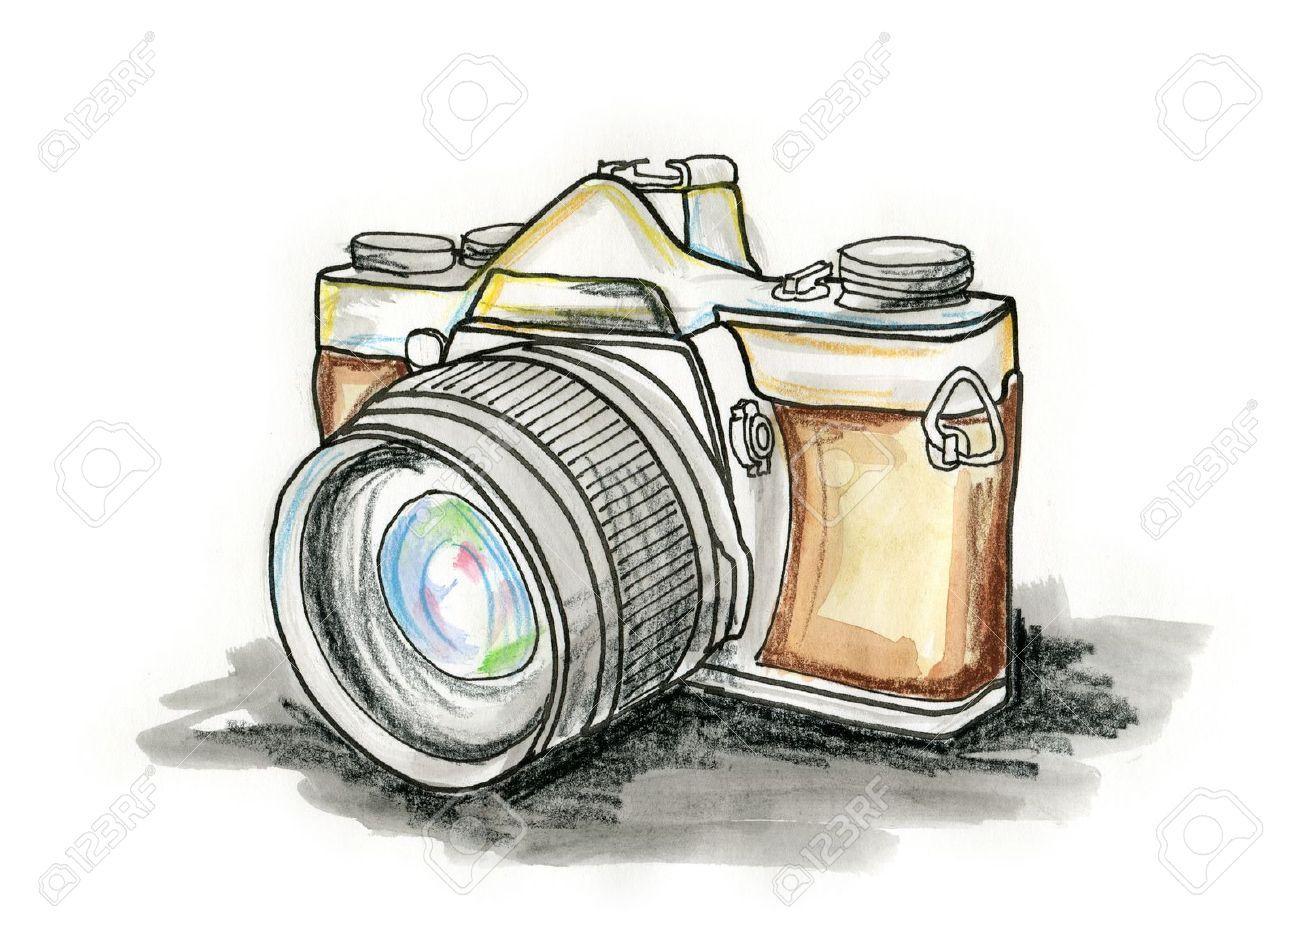 Acuarelas De Ninos Camaras Fotos Buscar Con Google Dibujos Camaras Fotograficas Arte Con Camara Manos Dibujo